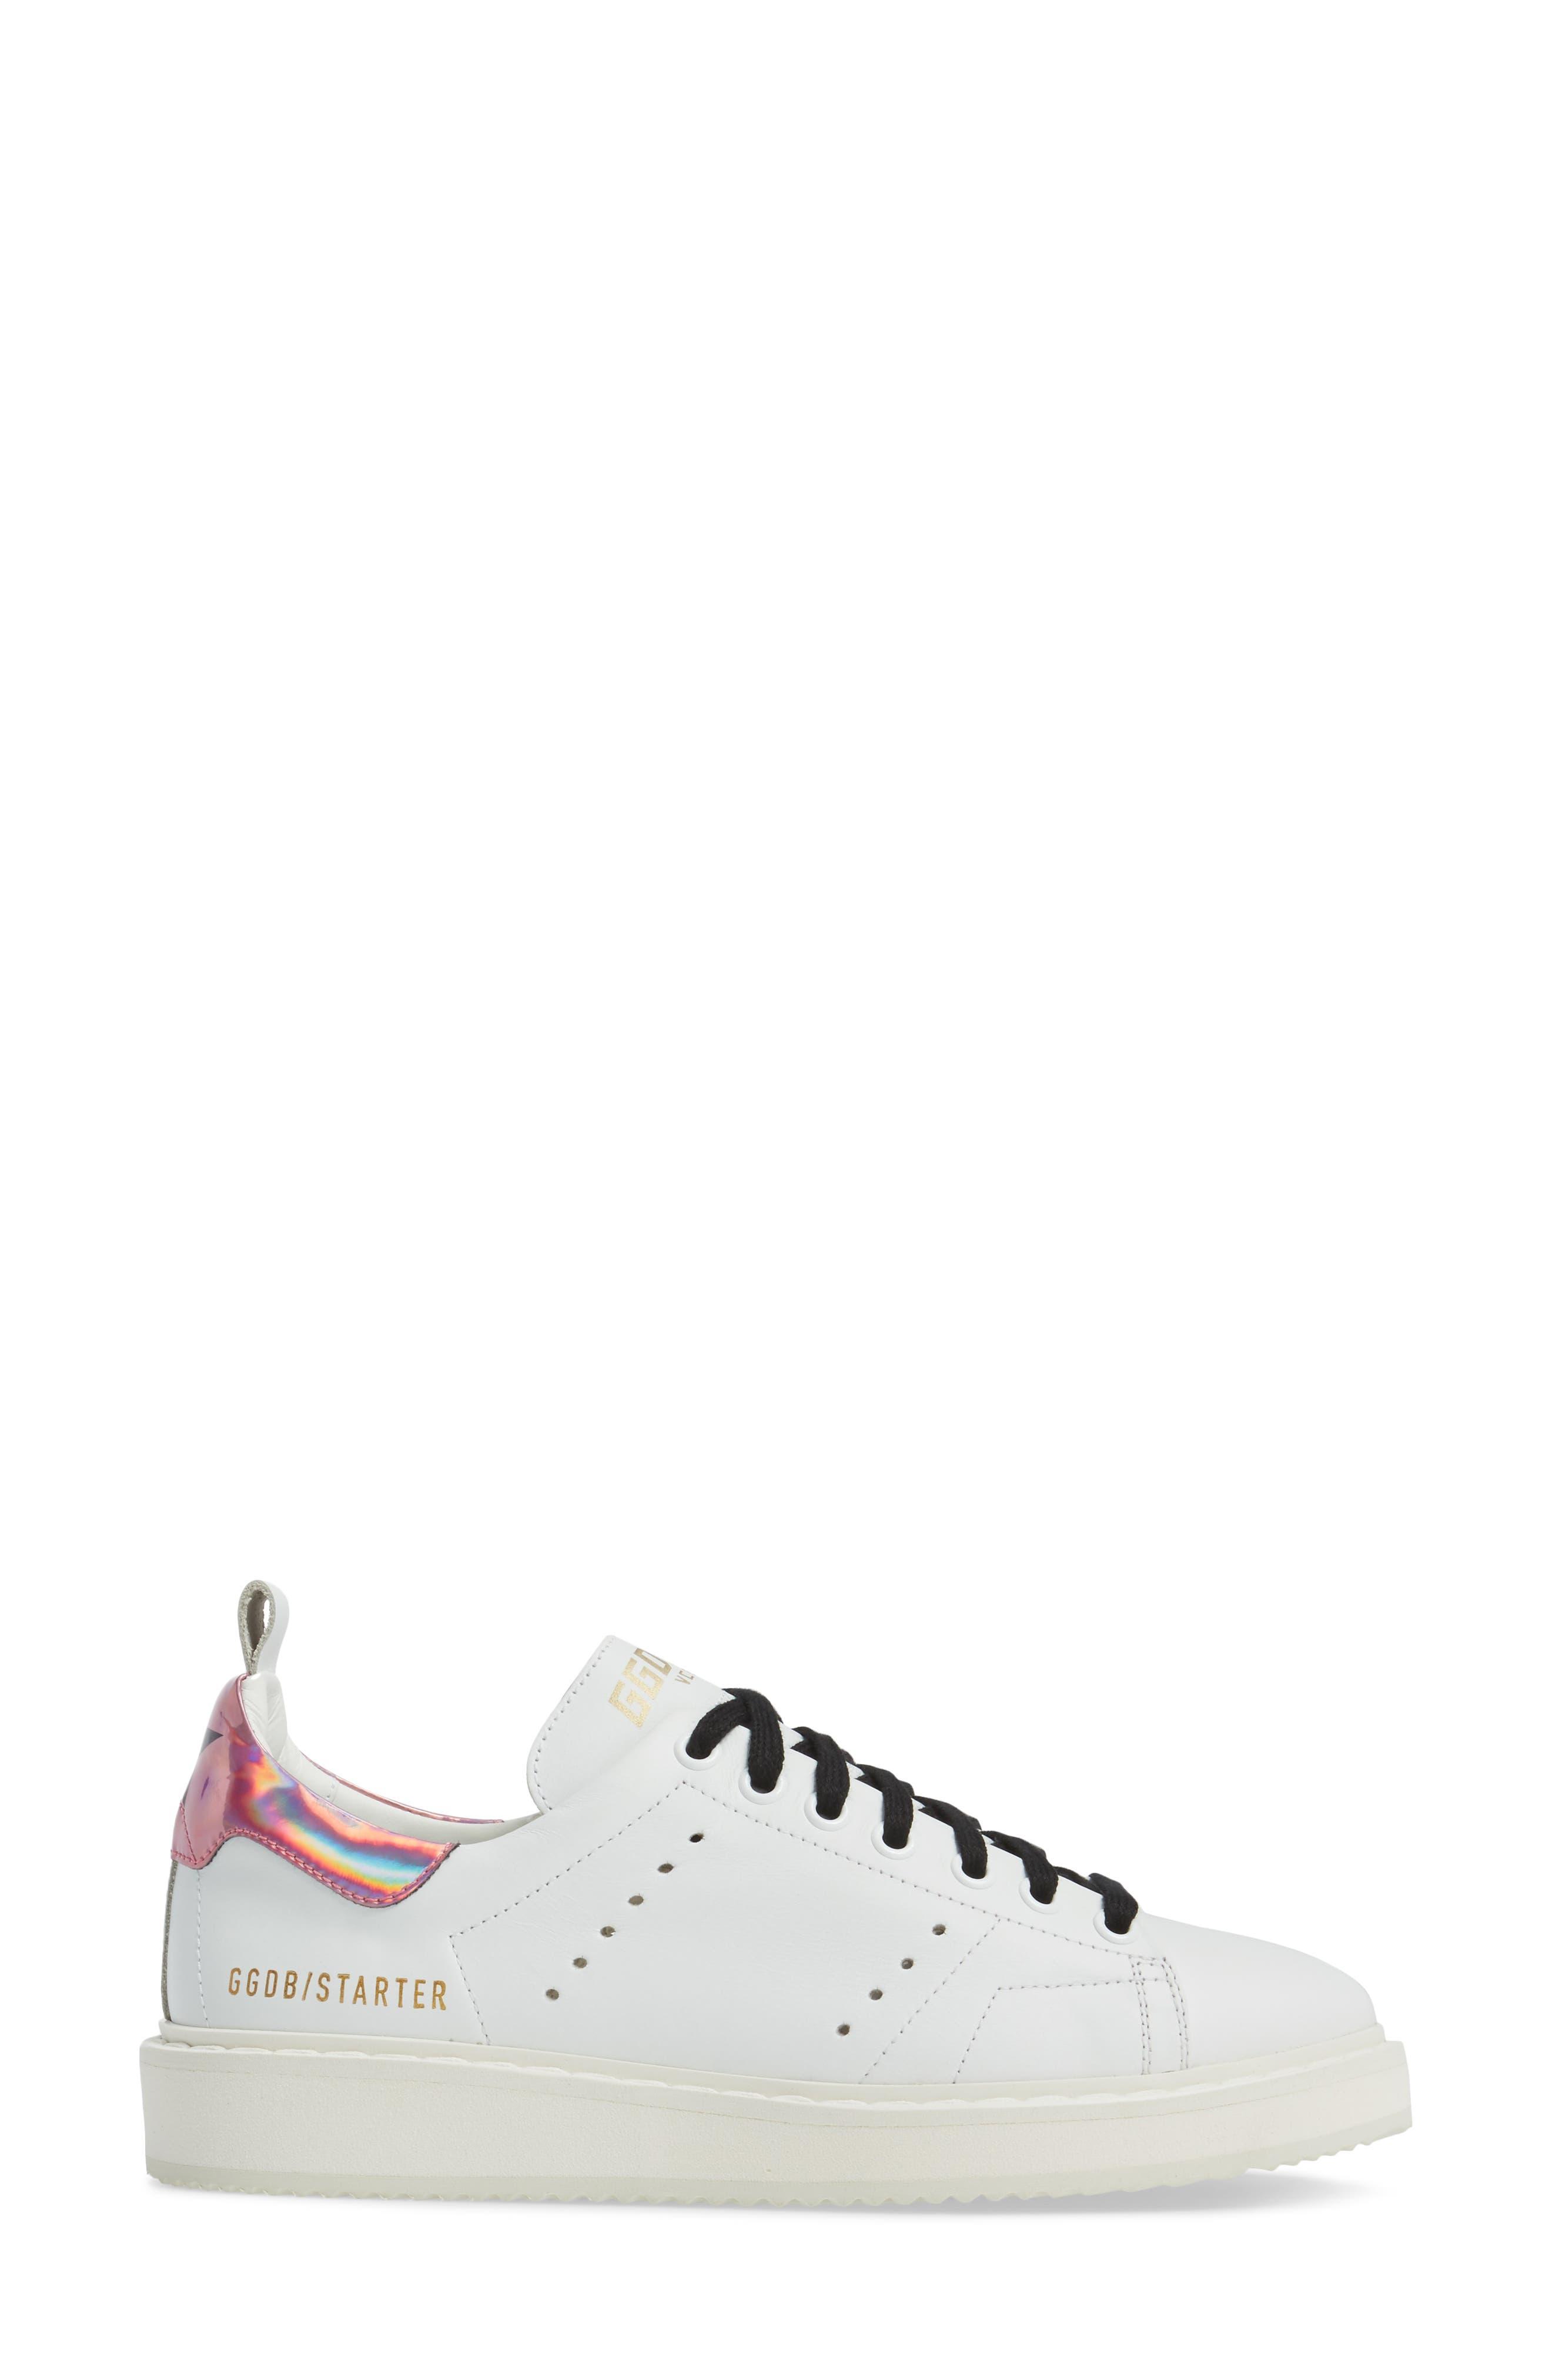 Starter Low Top Sneaker,                             Alternate thumbnail 3, color,                             100